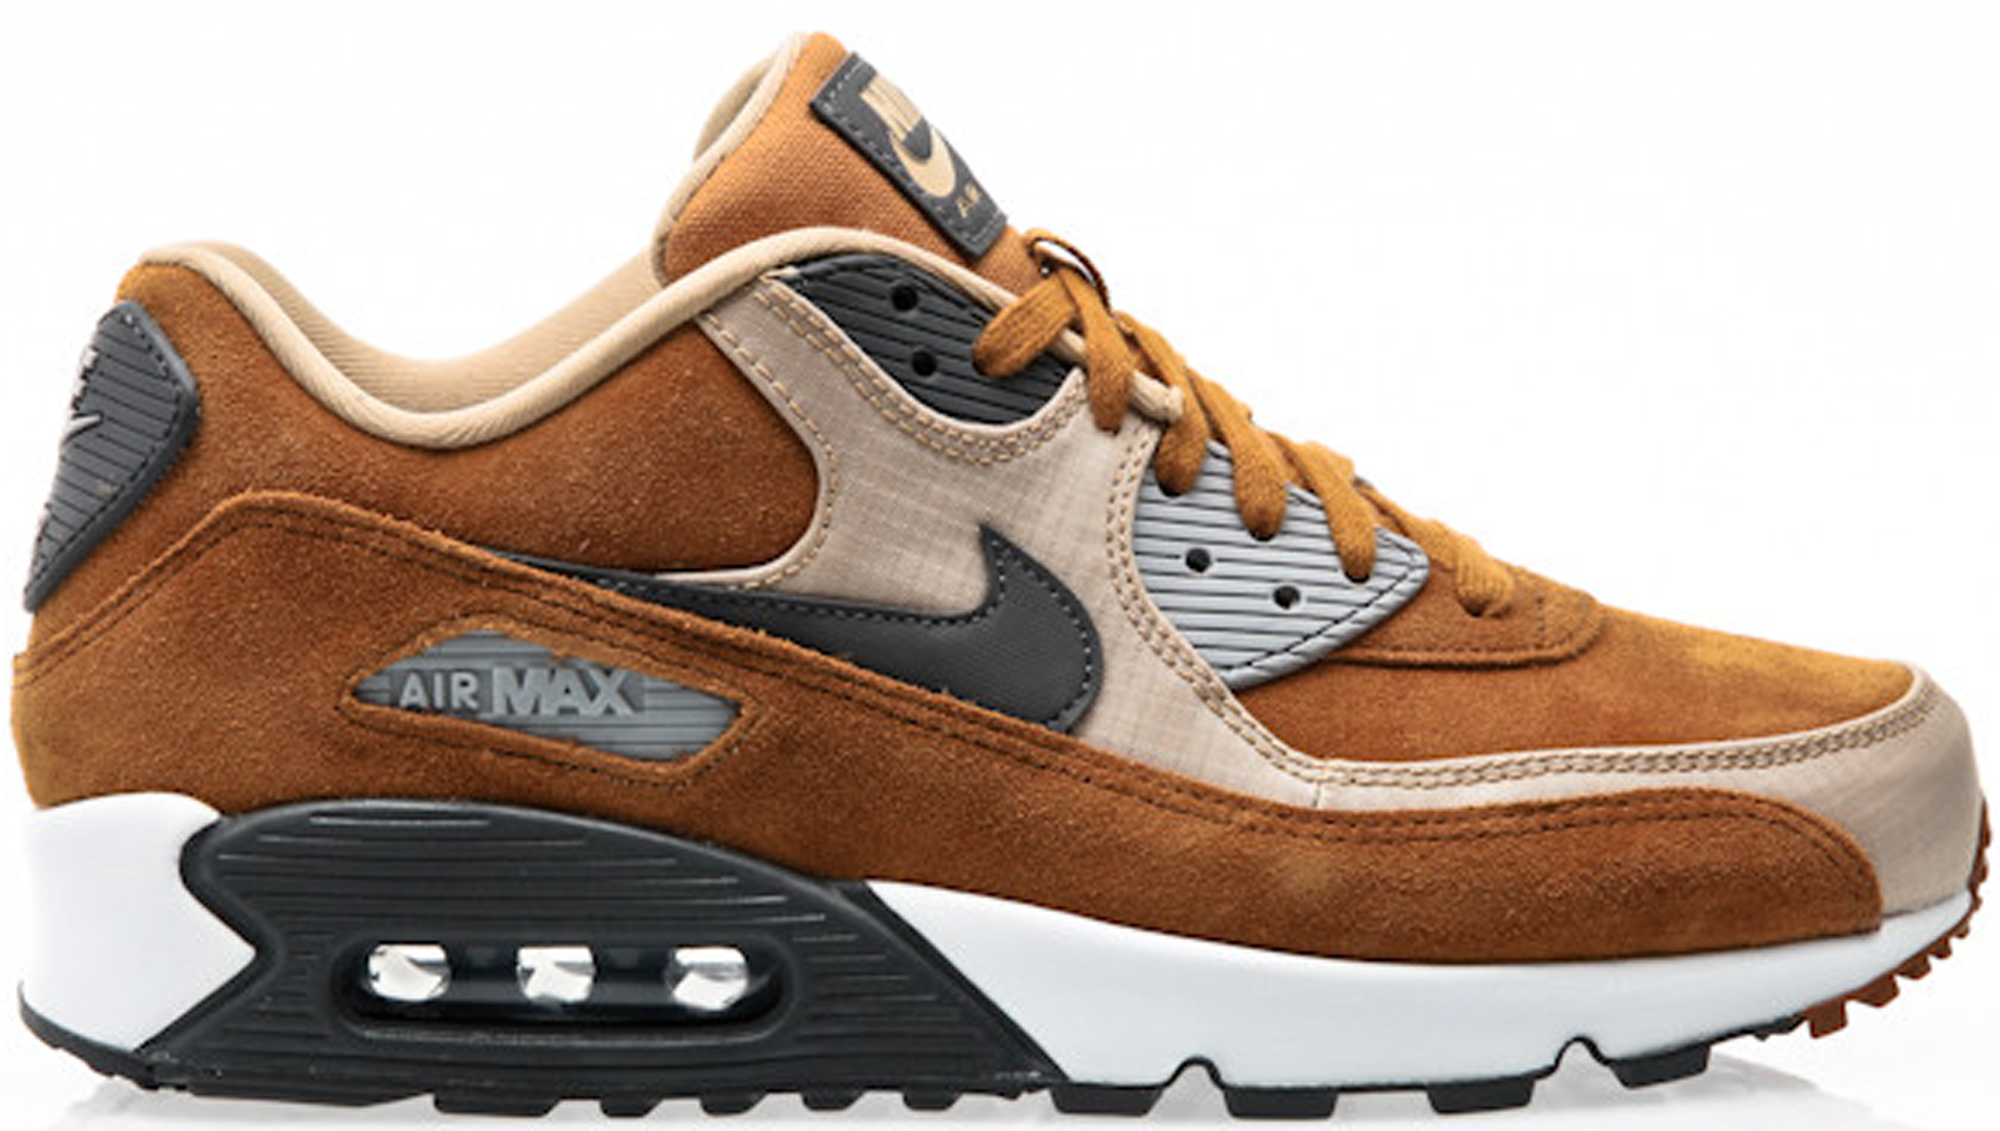 Nike Air Max 90 Desert Ochre - 700155-700